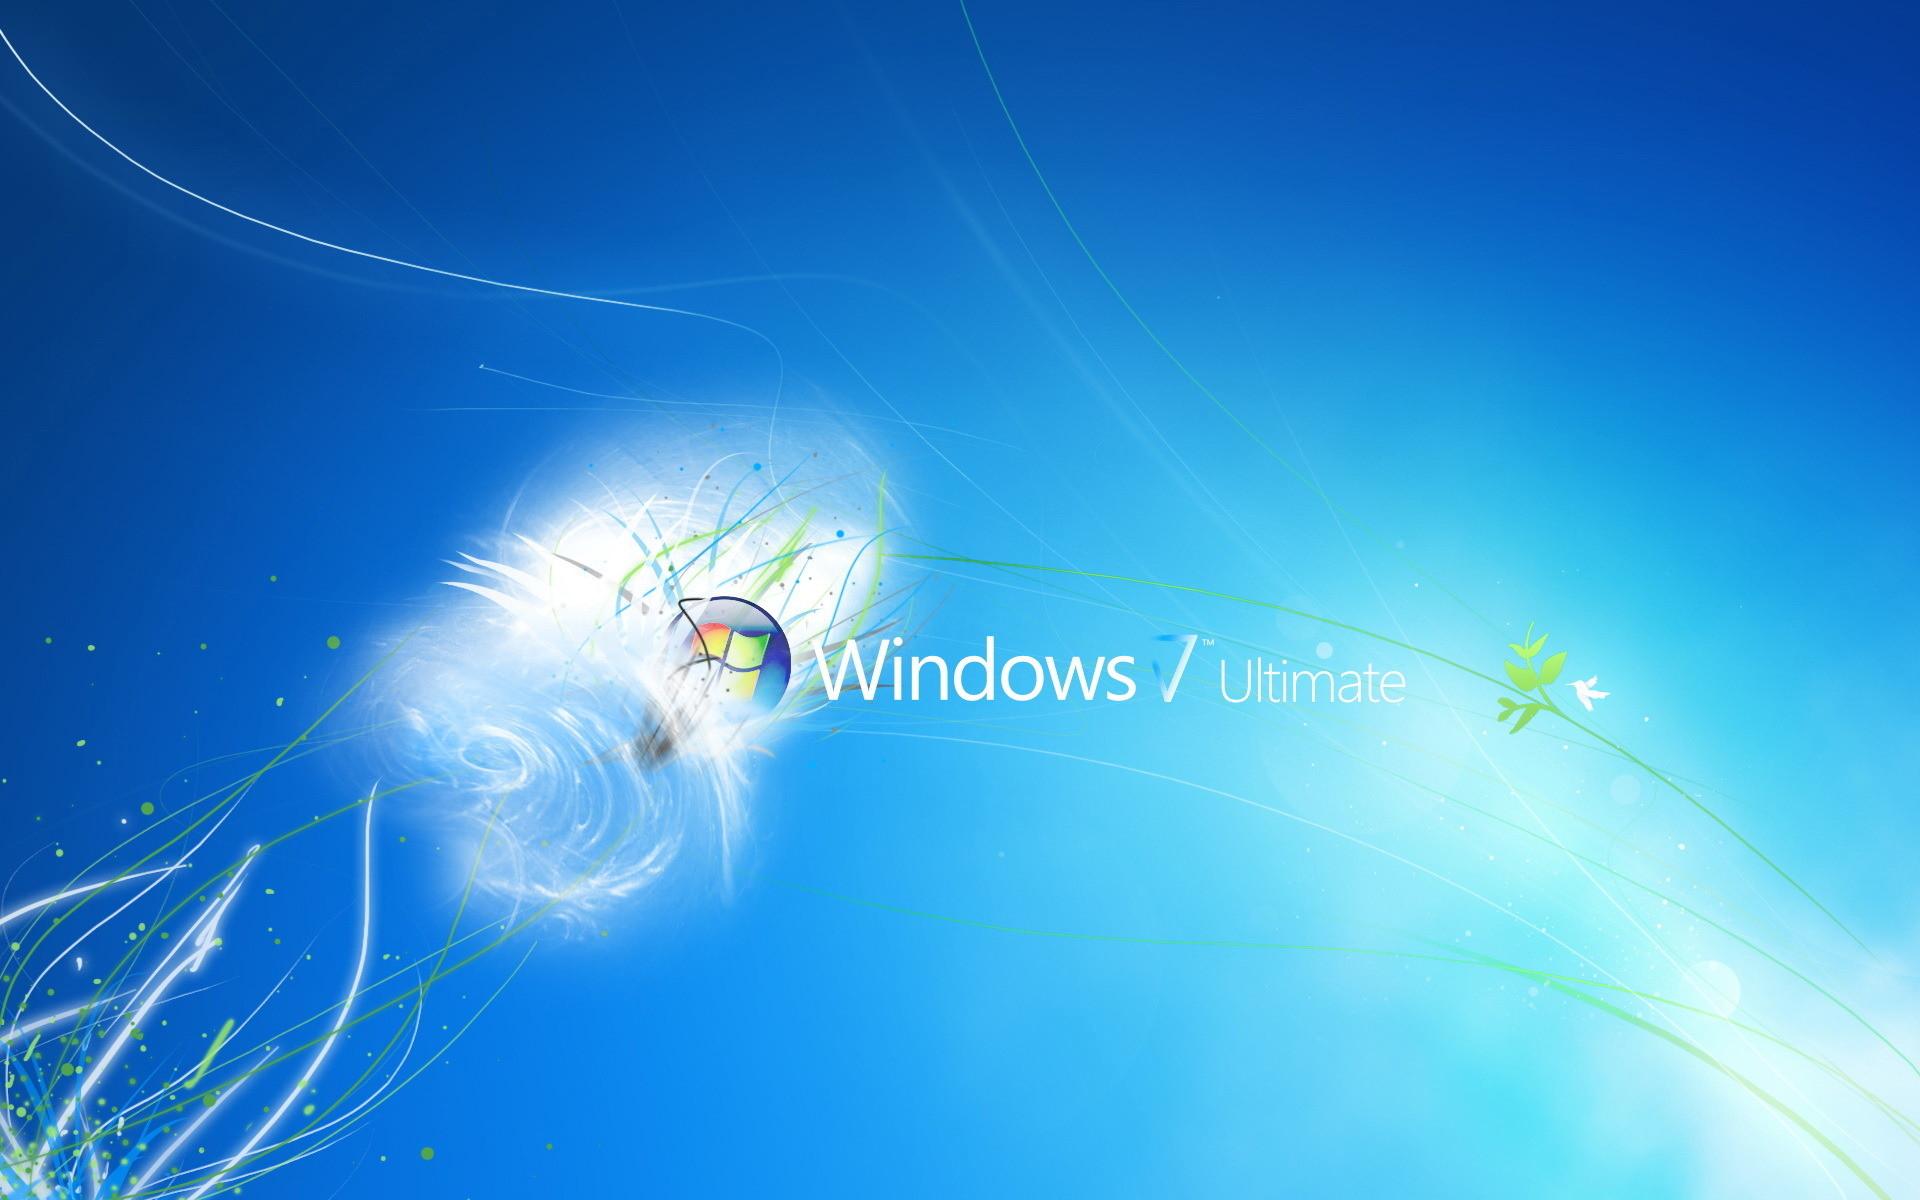 windows 7 home premium wallpaper (64+ pictures)